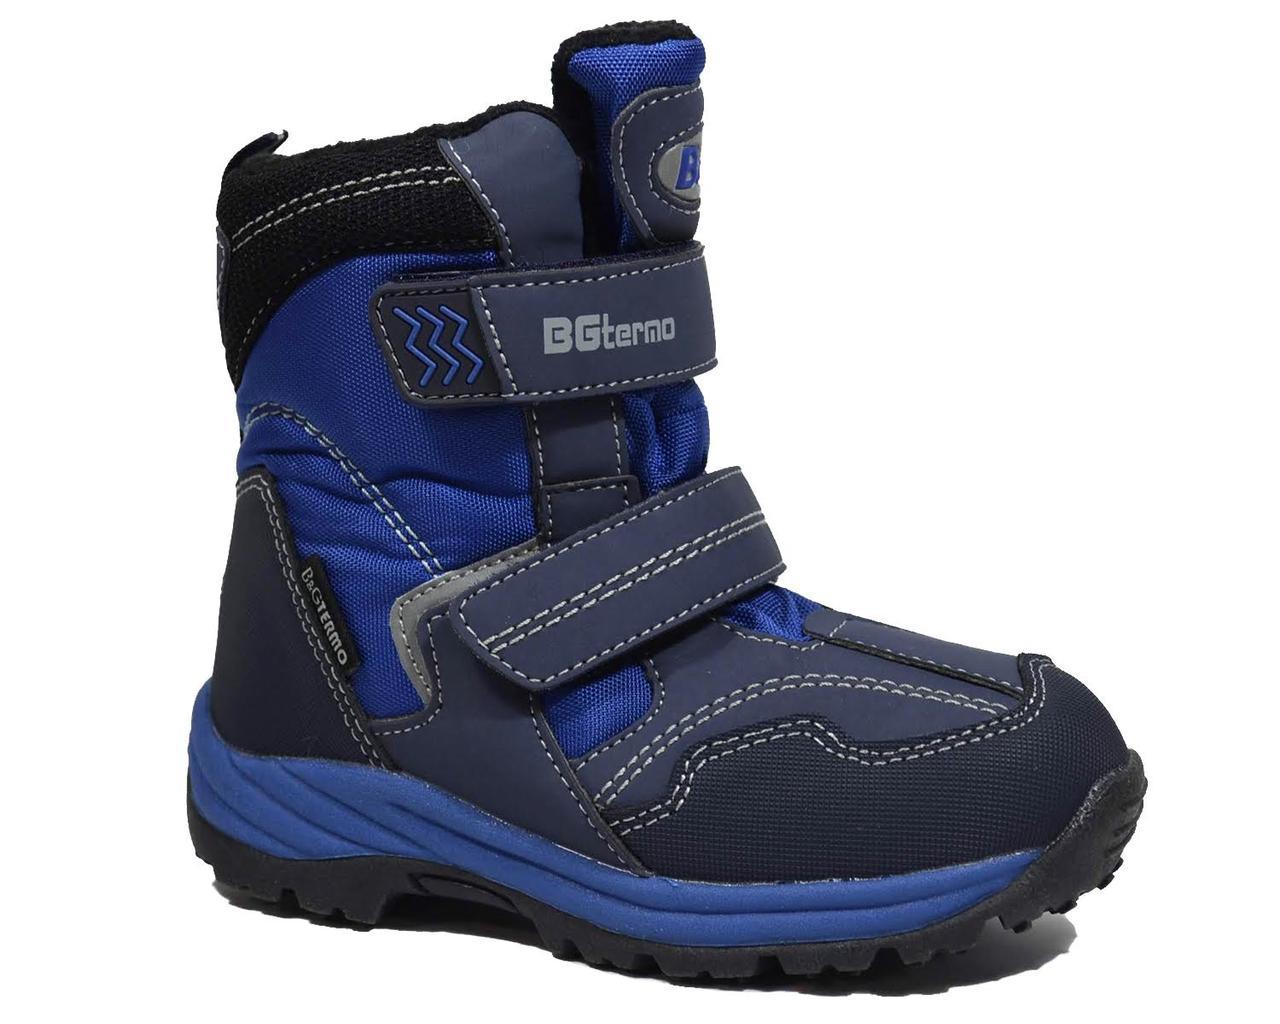 33963e88e Детские зимние термоботинки для мальчика, B&G-Termo синий, 28 -  Интернет-магазин